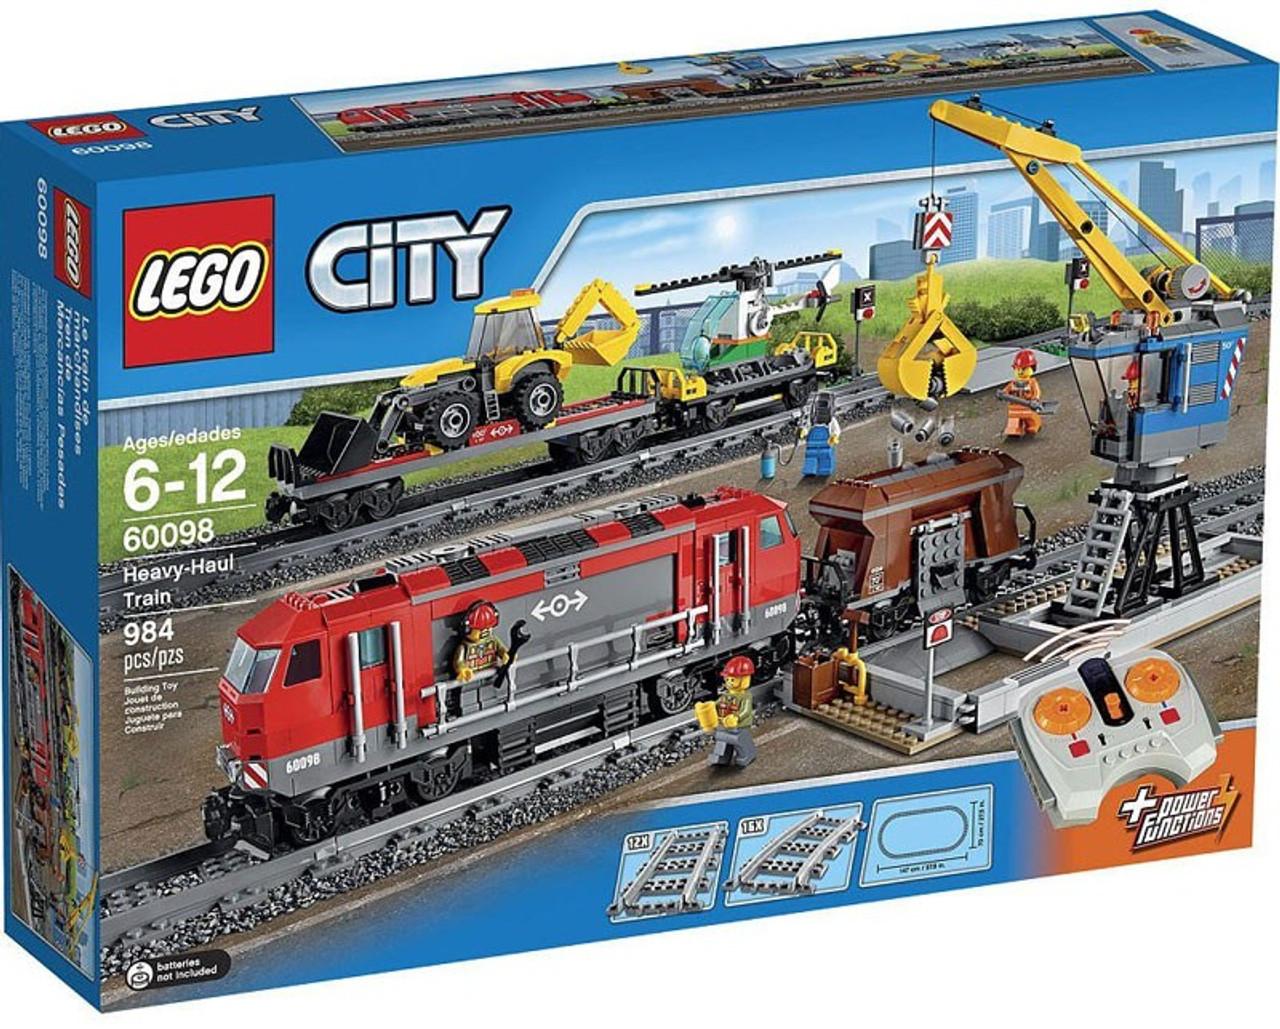 LEGO City Heavy-Haul Train Set 60098 - ToyWiz